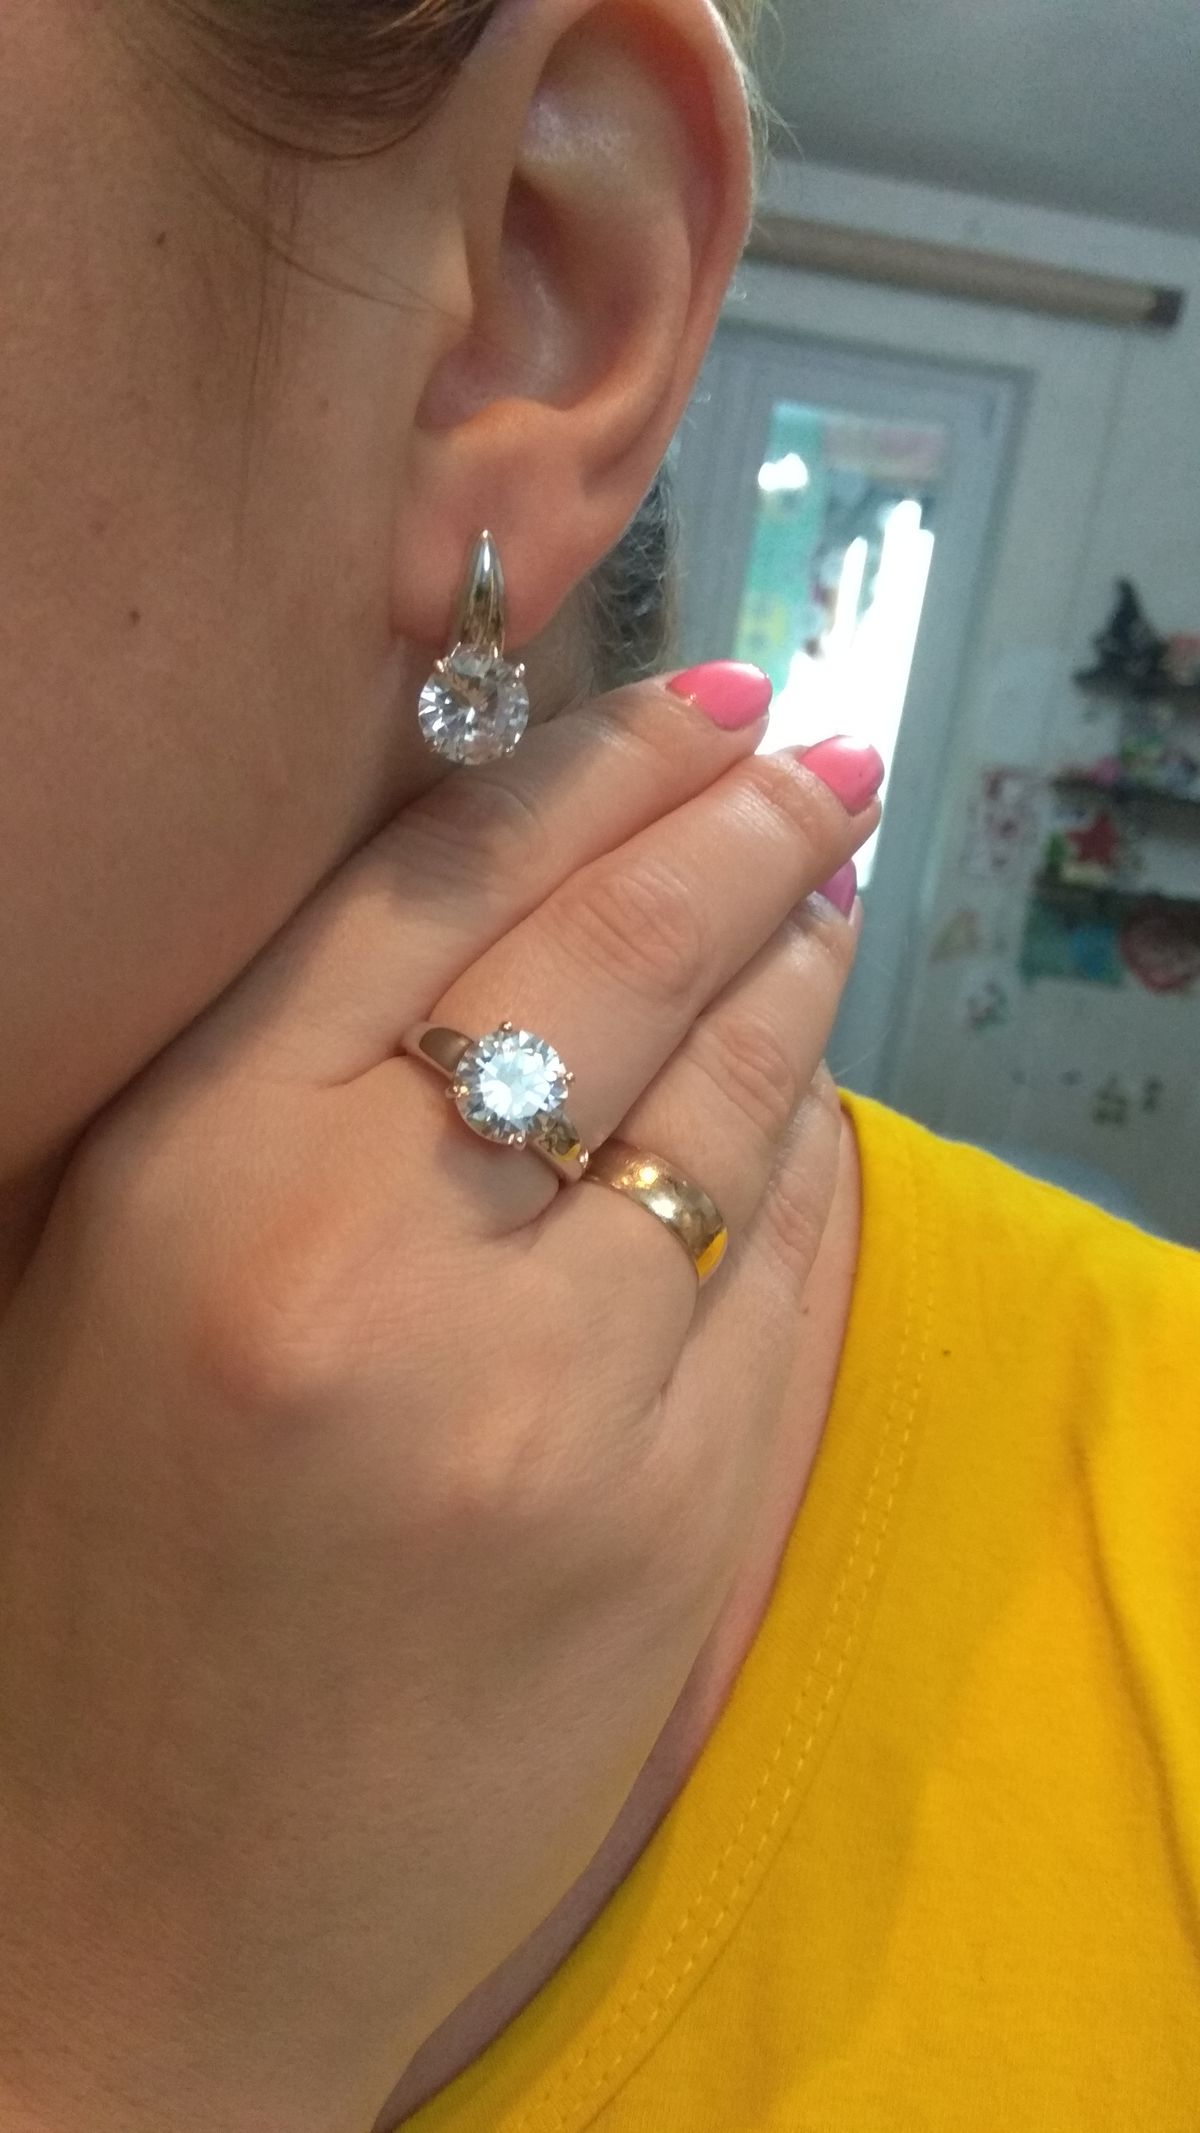 Нереально красивое кольцо